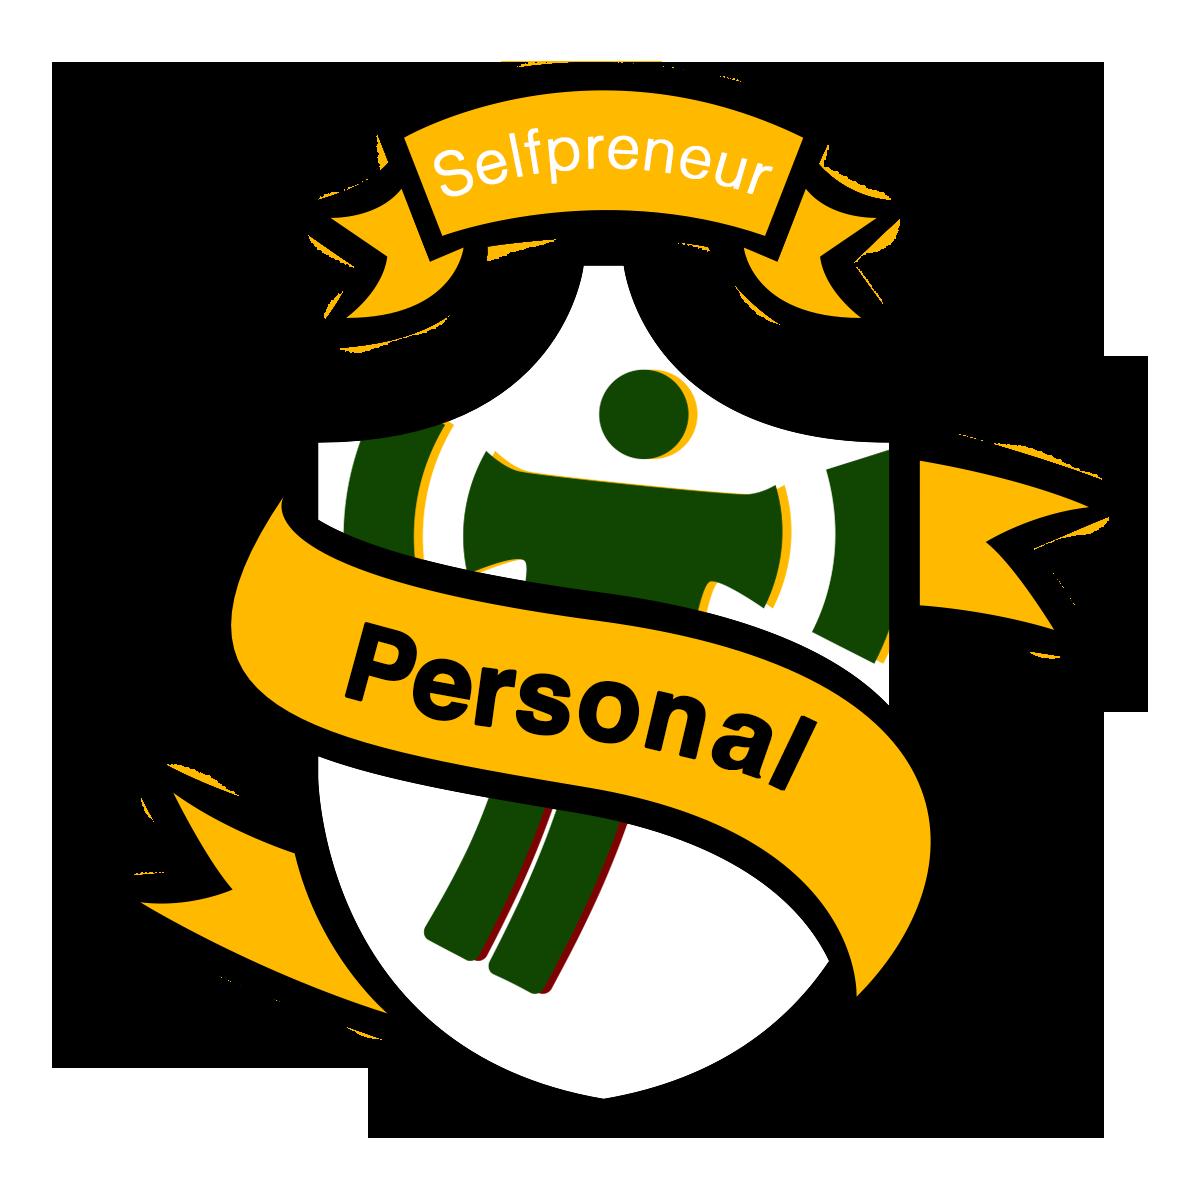 Selfpreneur for Personal Relationships